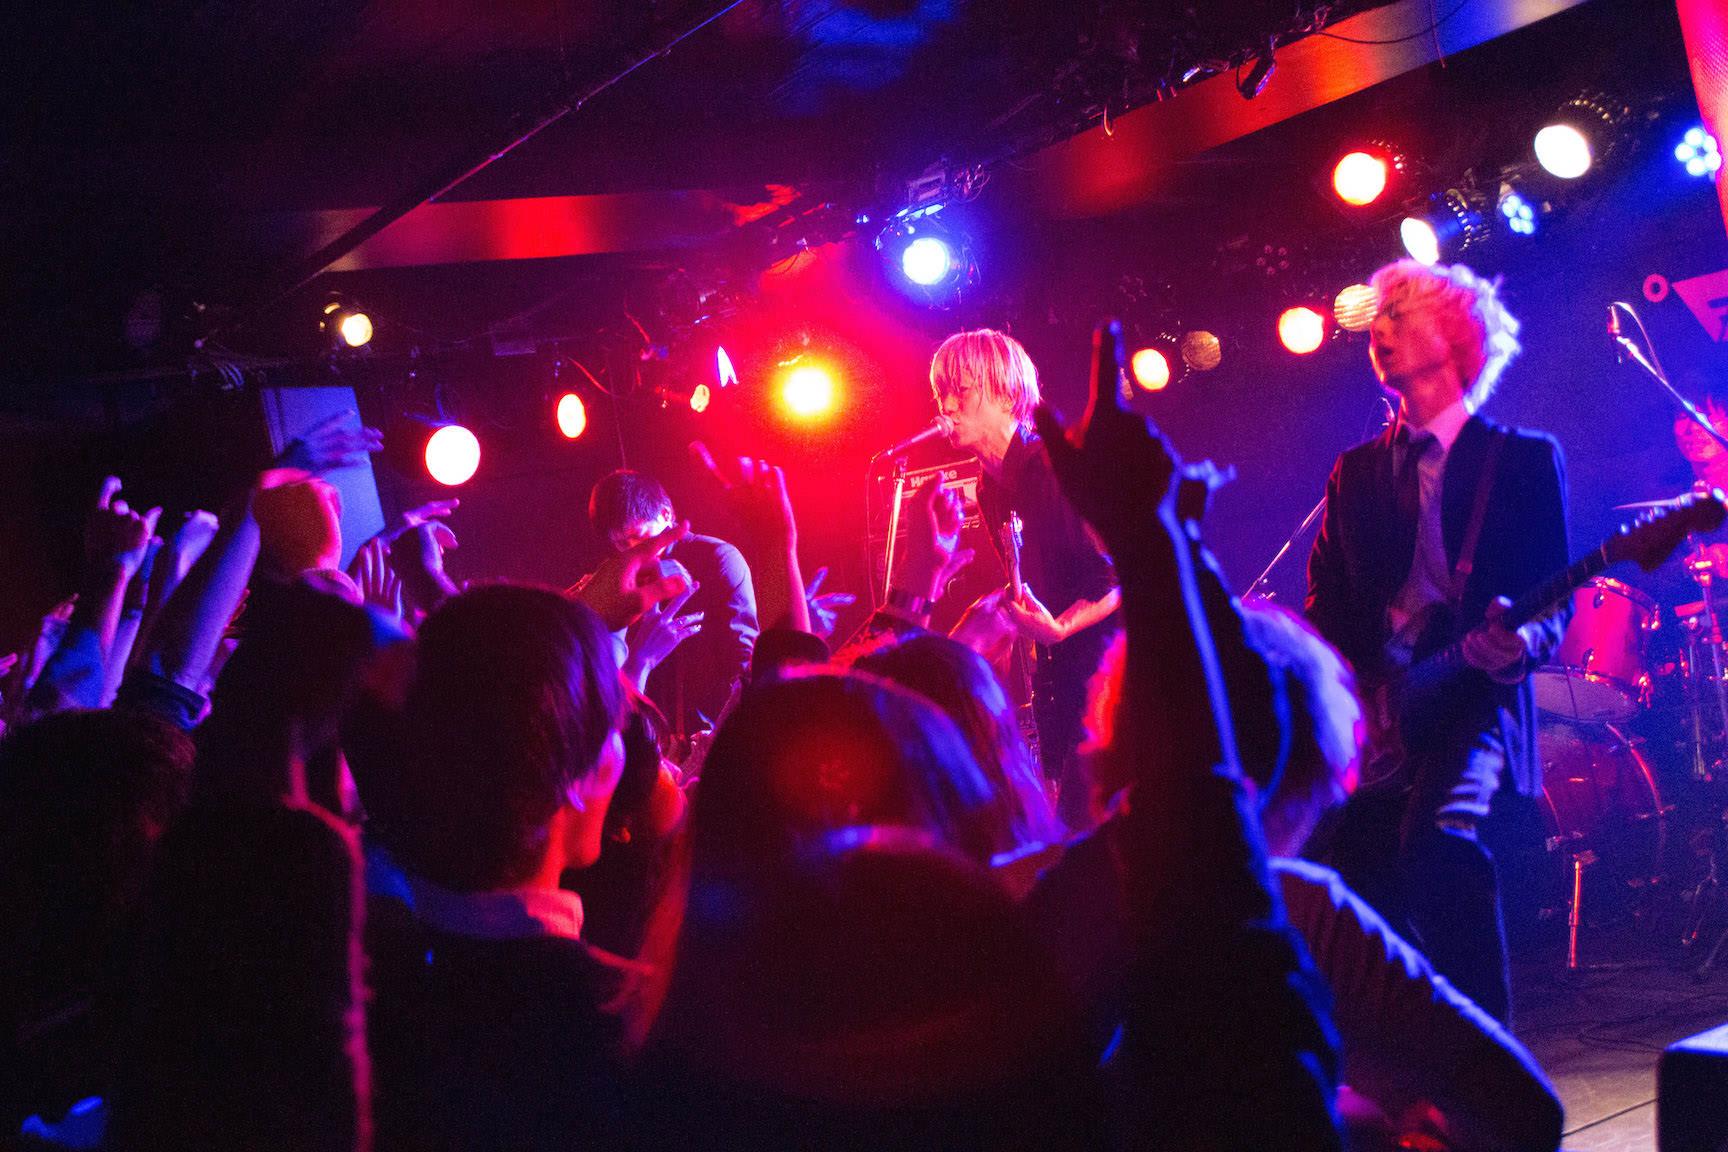 The pinballs live at shindaita fever dec 21th 2014 17